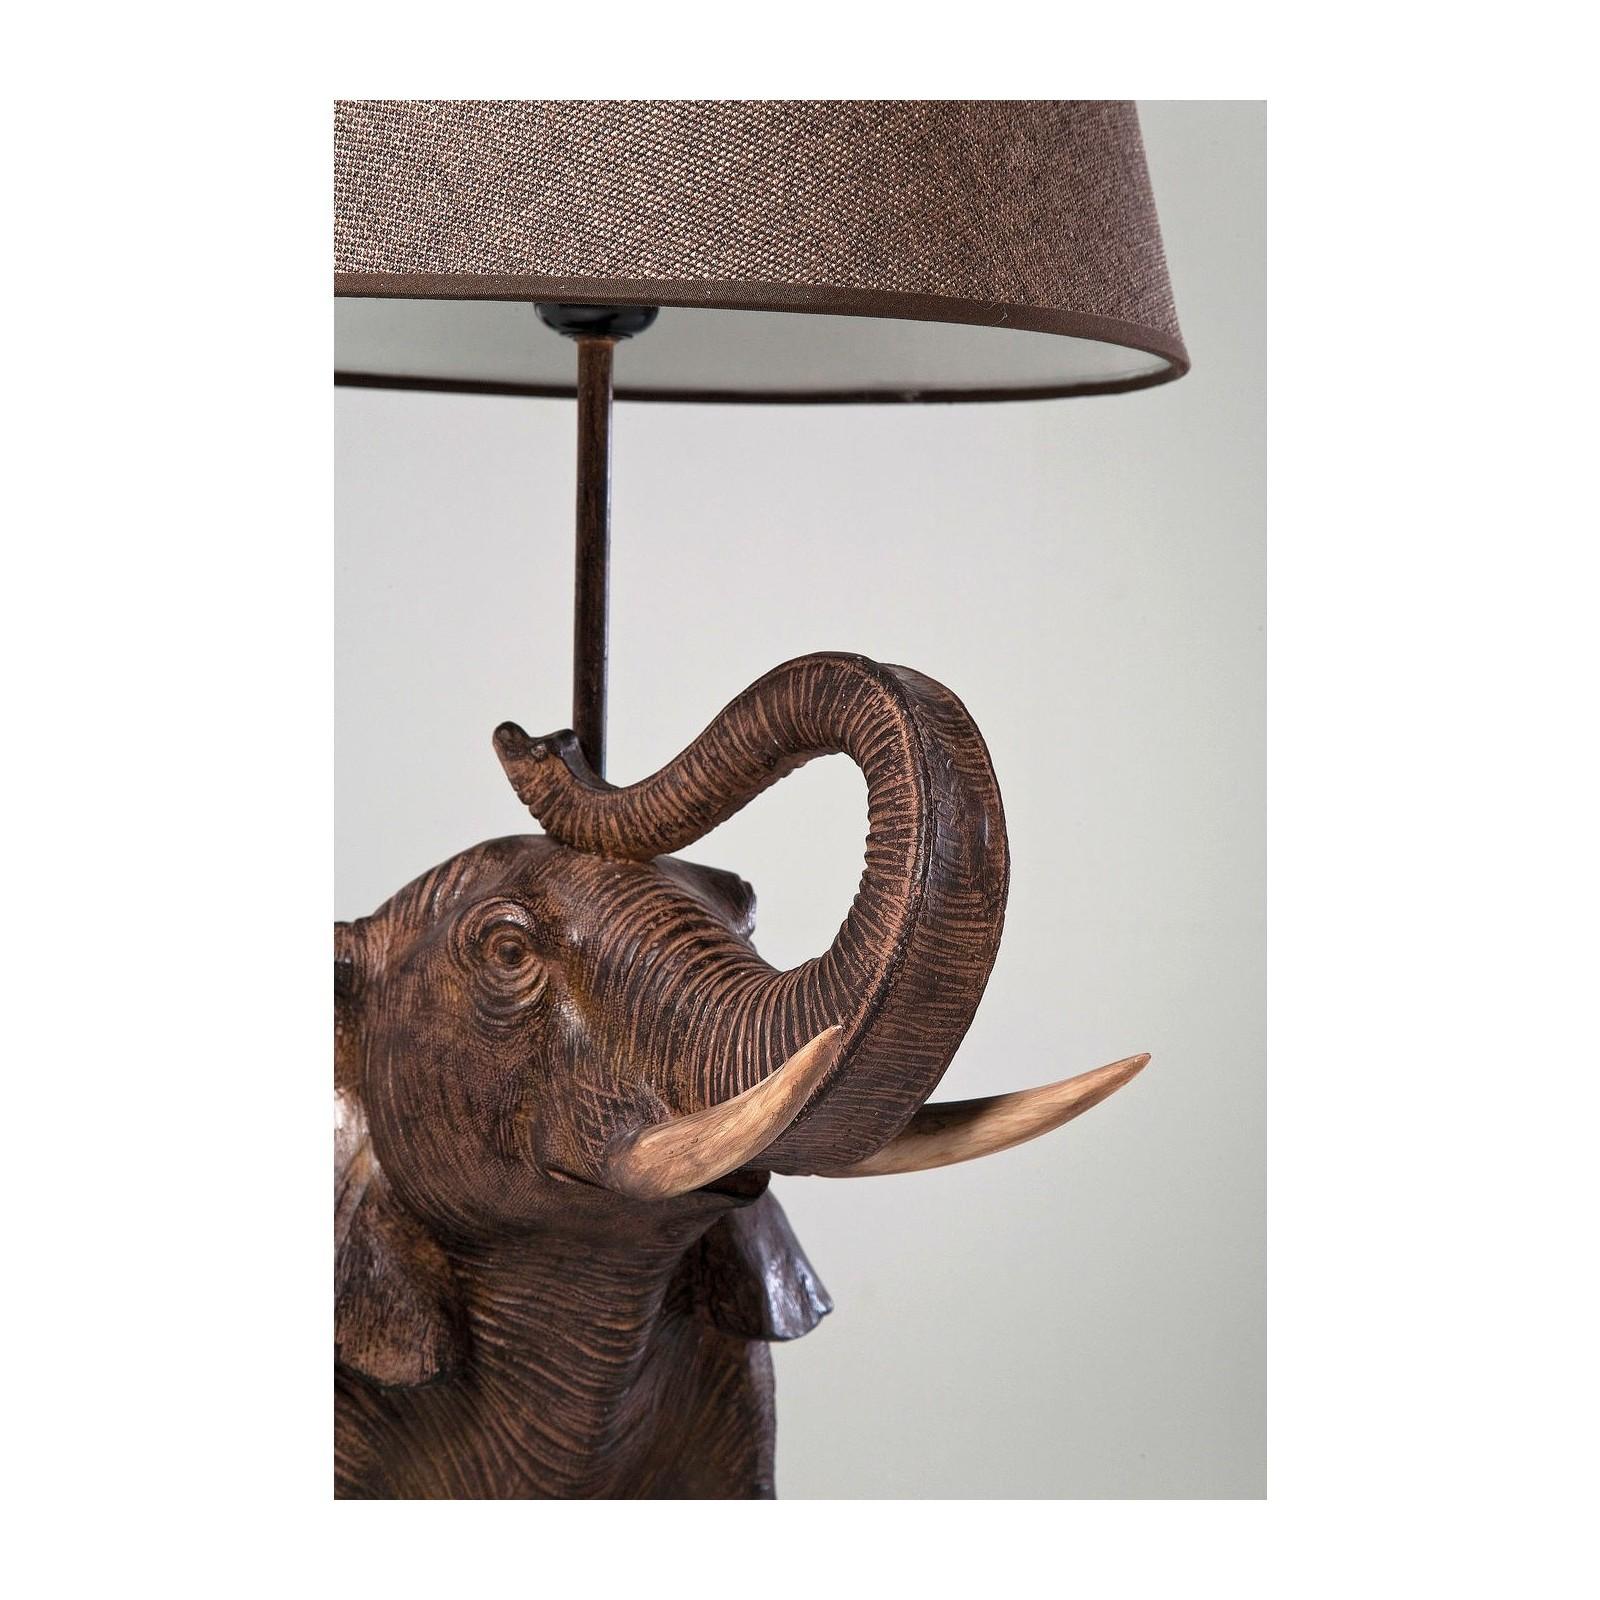 De Soldes Design Elephant Poser Lampe À Maisongt; Luminaires Table Kare Safari Lampes NywmPv8On0